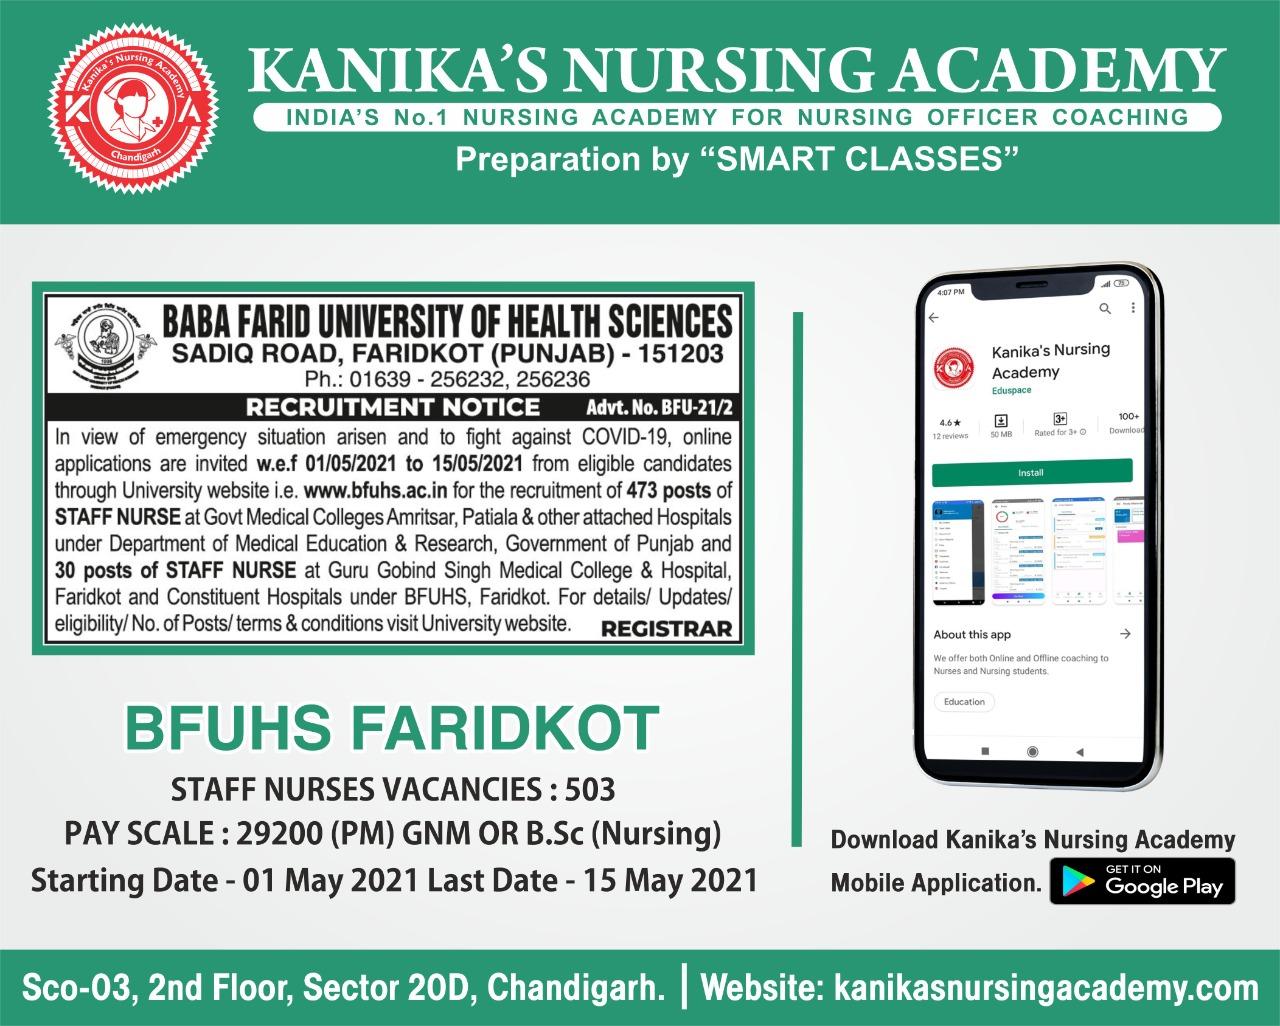 KANIKA'S NURSING ACADEMY, bfuhs staff nurses vacancies, punjab staff nurses vacancies,  staff nurses vacancies in punjab, nursing coaching in punjab, staff nurse coaching in chandigarh, nursing coaching in chandigarh